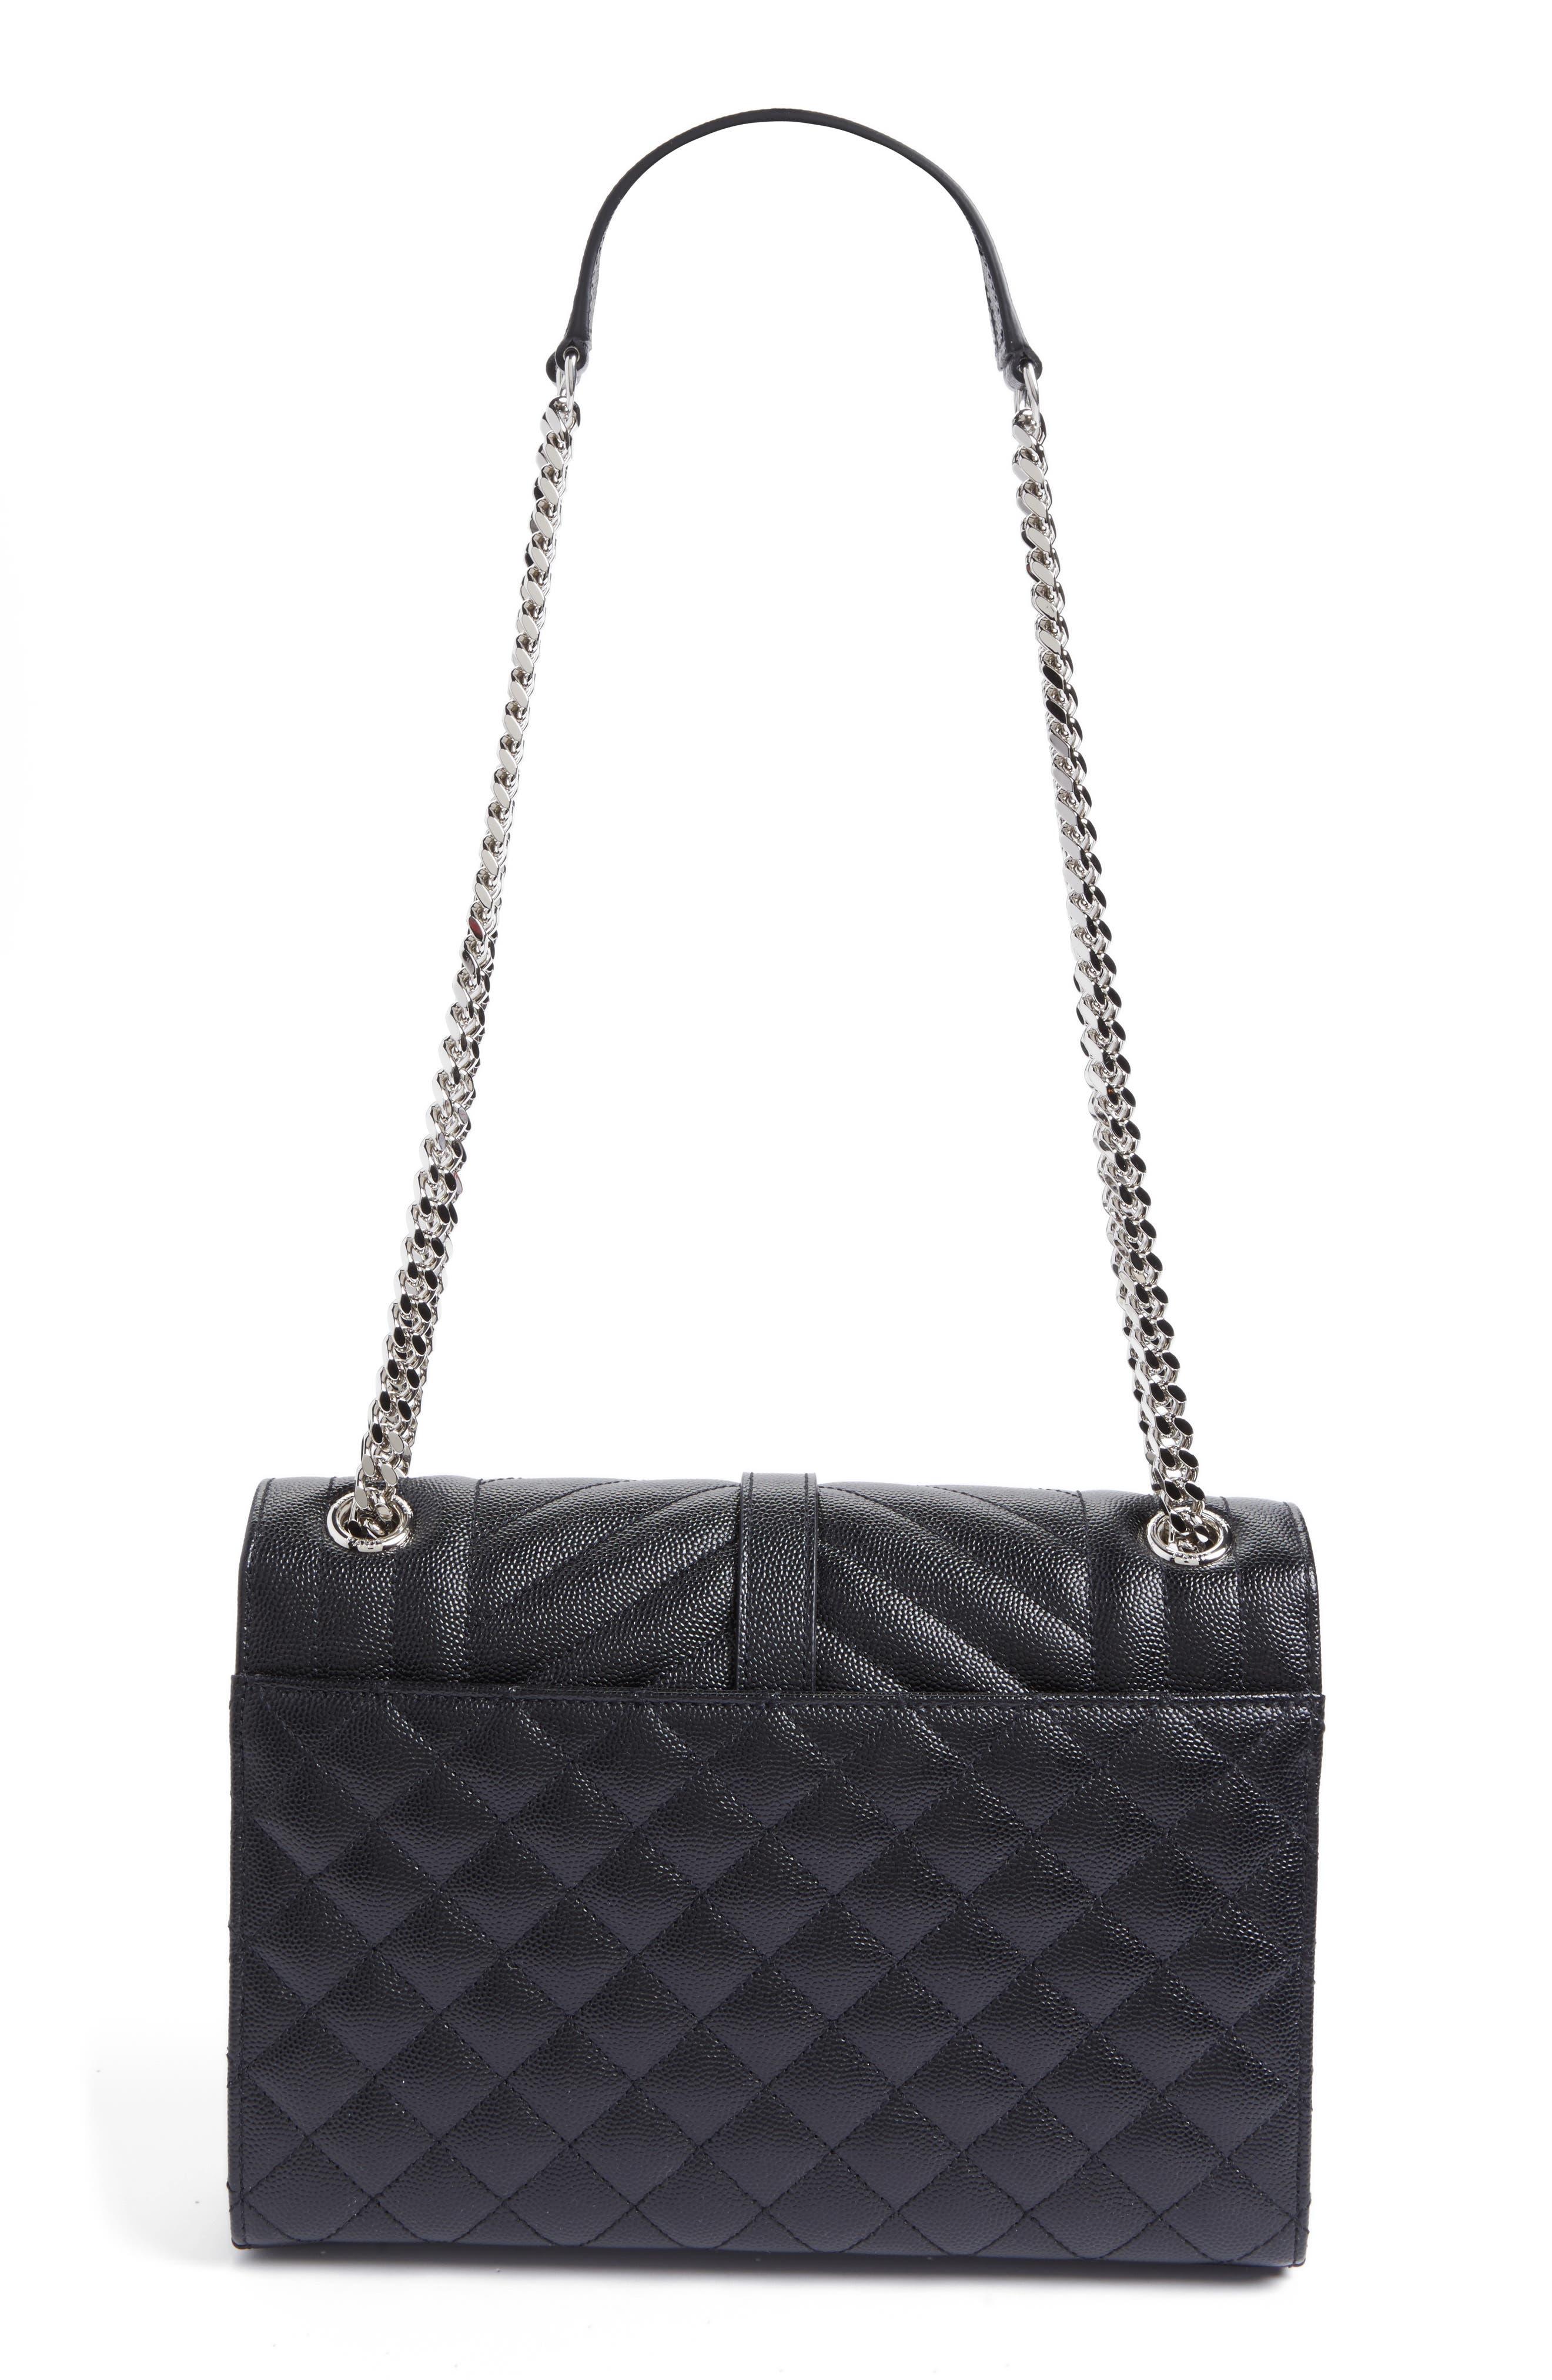 SAINT LAURENT, Large Monogram Quilted Leather Shoulder Bag, Alternate thumbnail 2, color, NERO